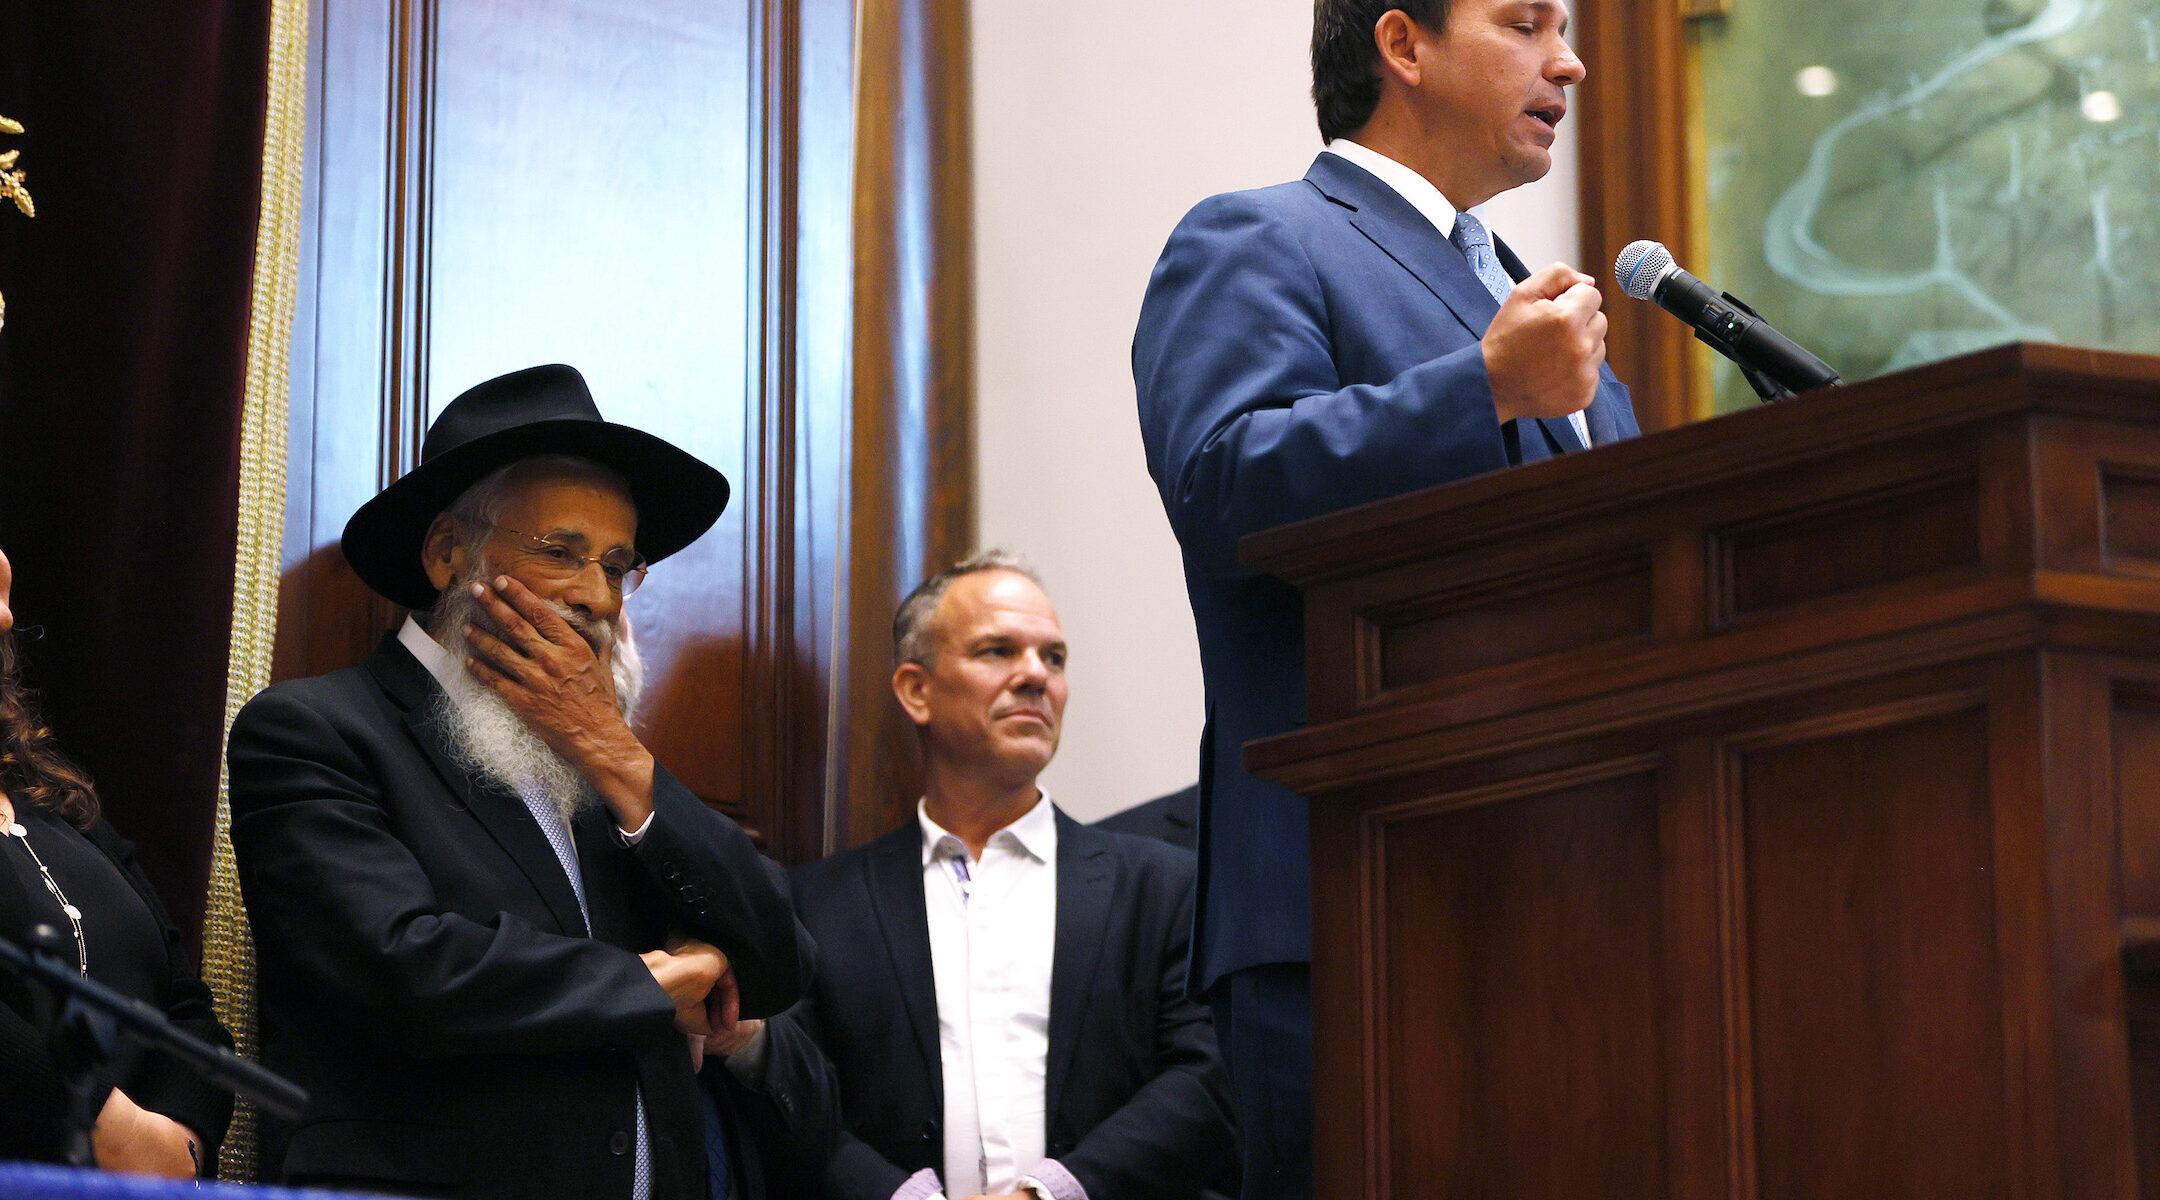 Rabbi Sholom Lipskar (left) listens as Florida Gov. Ron DeSantis speaks during a press conference at the Shul of Bal Harbour on June 14, 2021 in Surfside, Florida. (Photo/JTA-Joe Raedle-Getty Images)